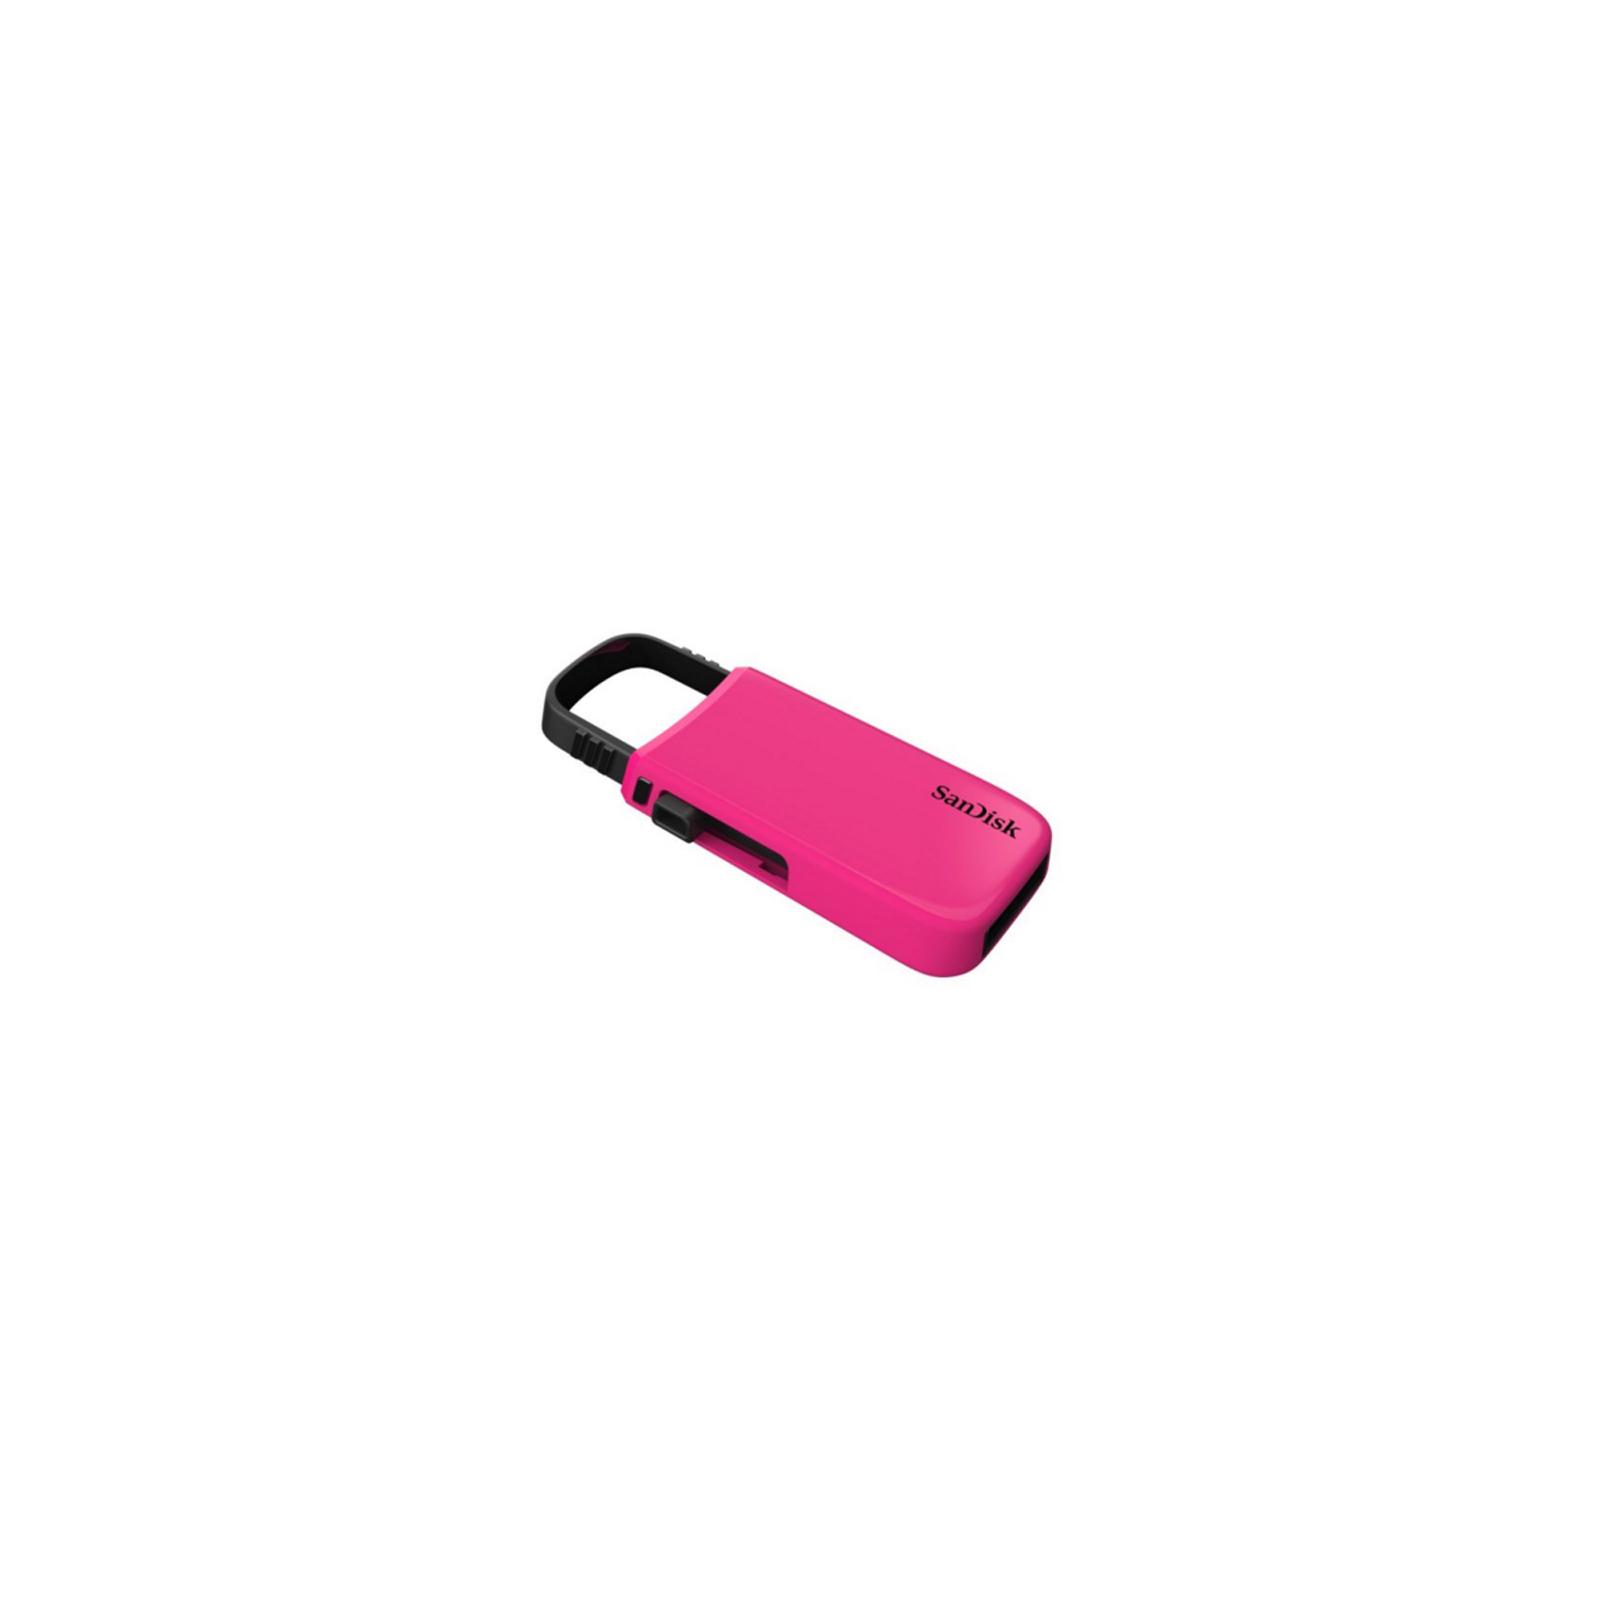 USB флеш накопитель SANDISK 32GB Cruzer U Pink USB 2.0 (SDCZ59-032G-B35PZ) изображение 2